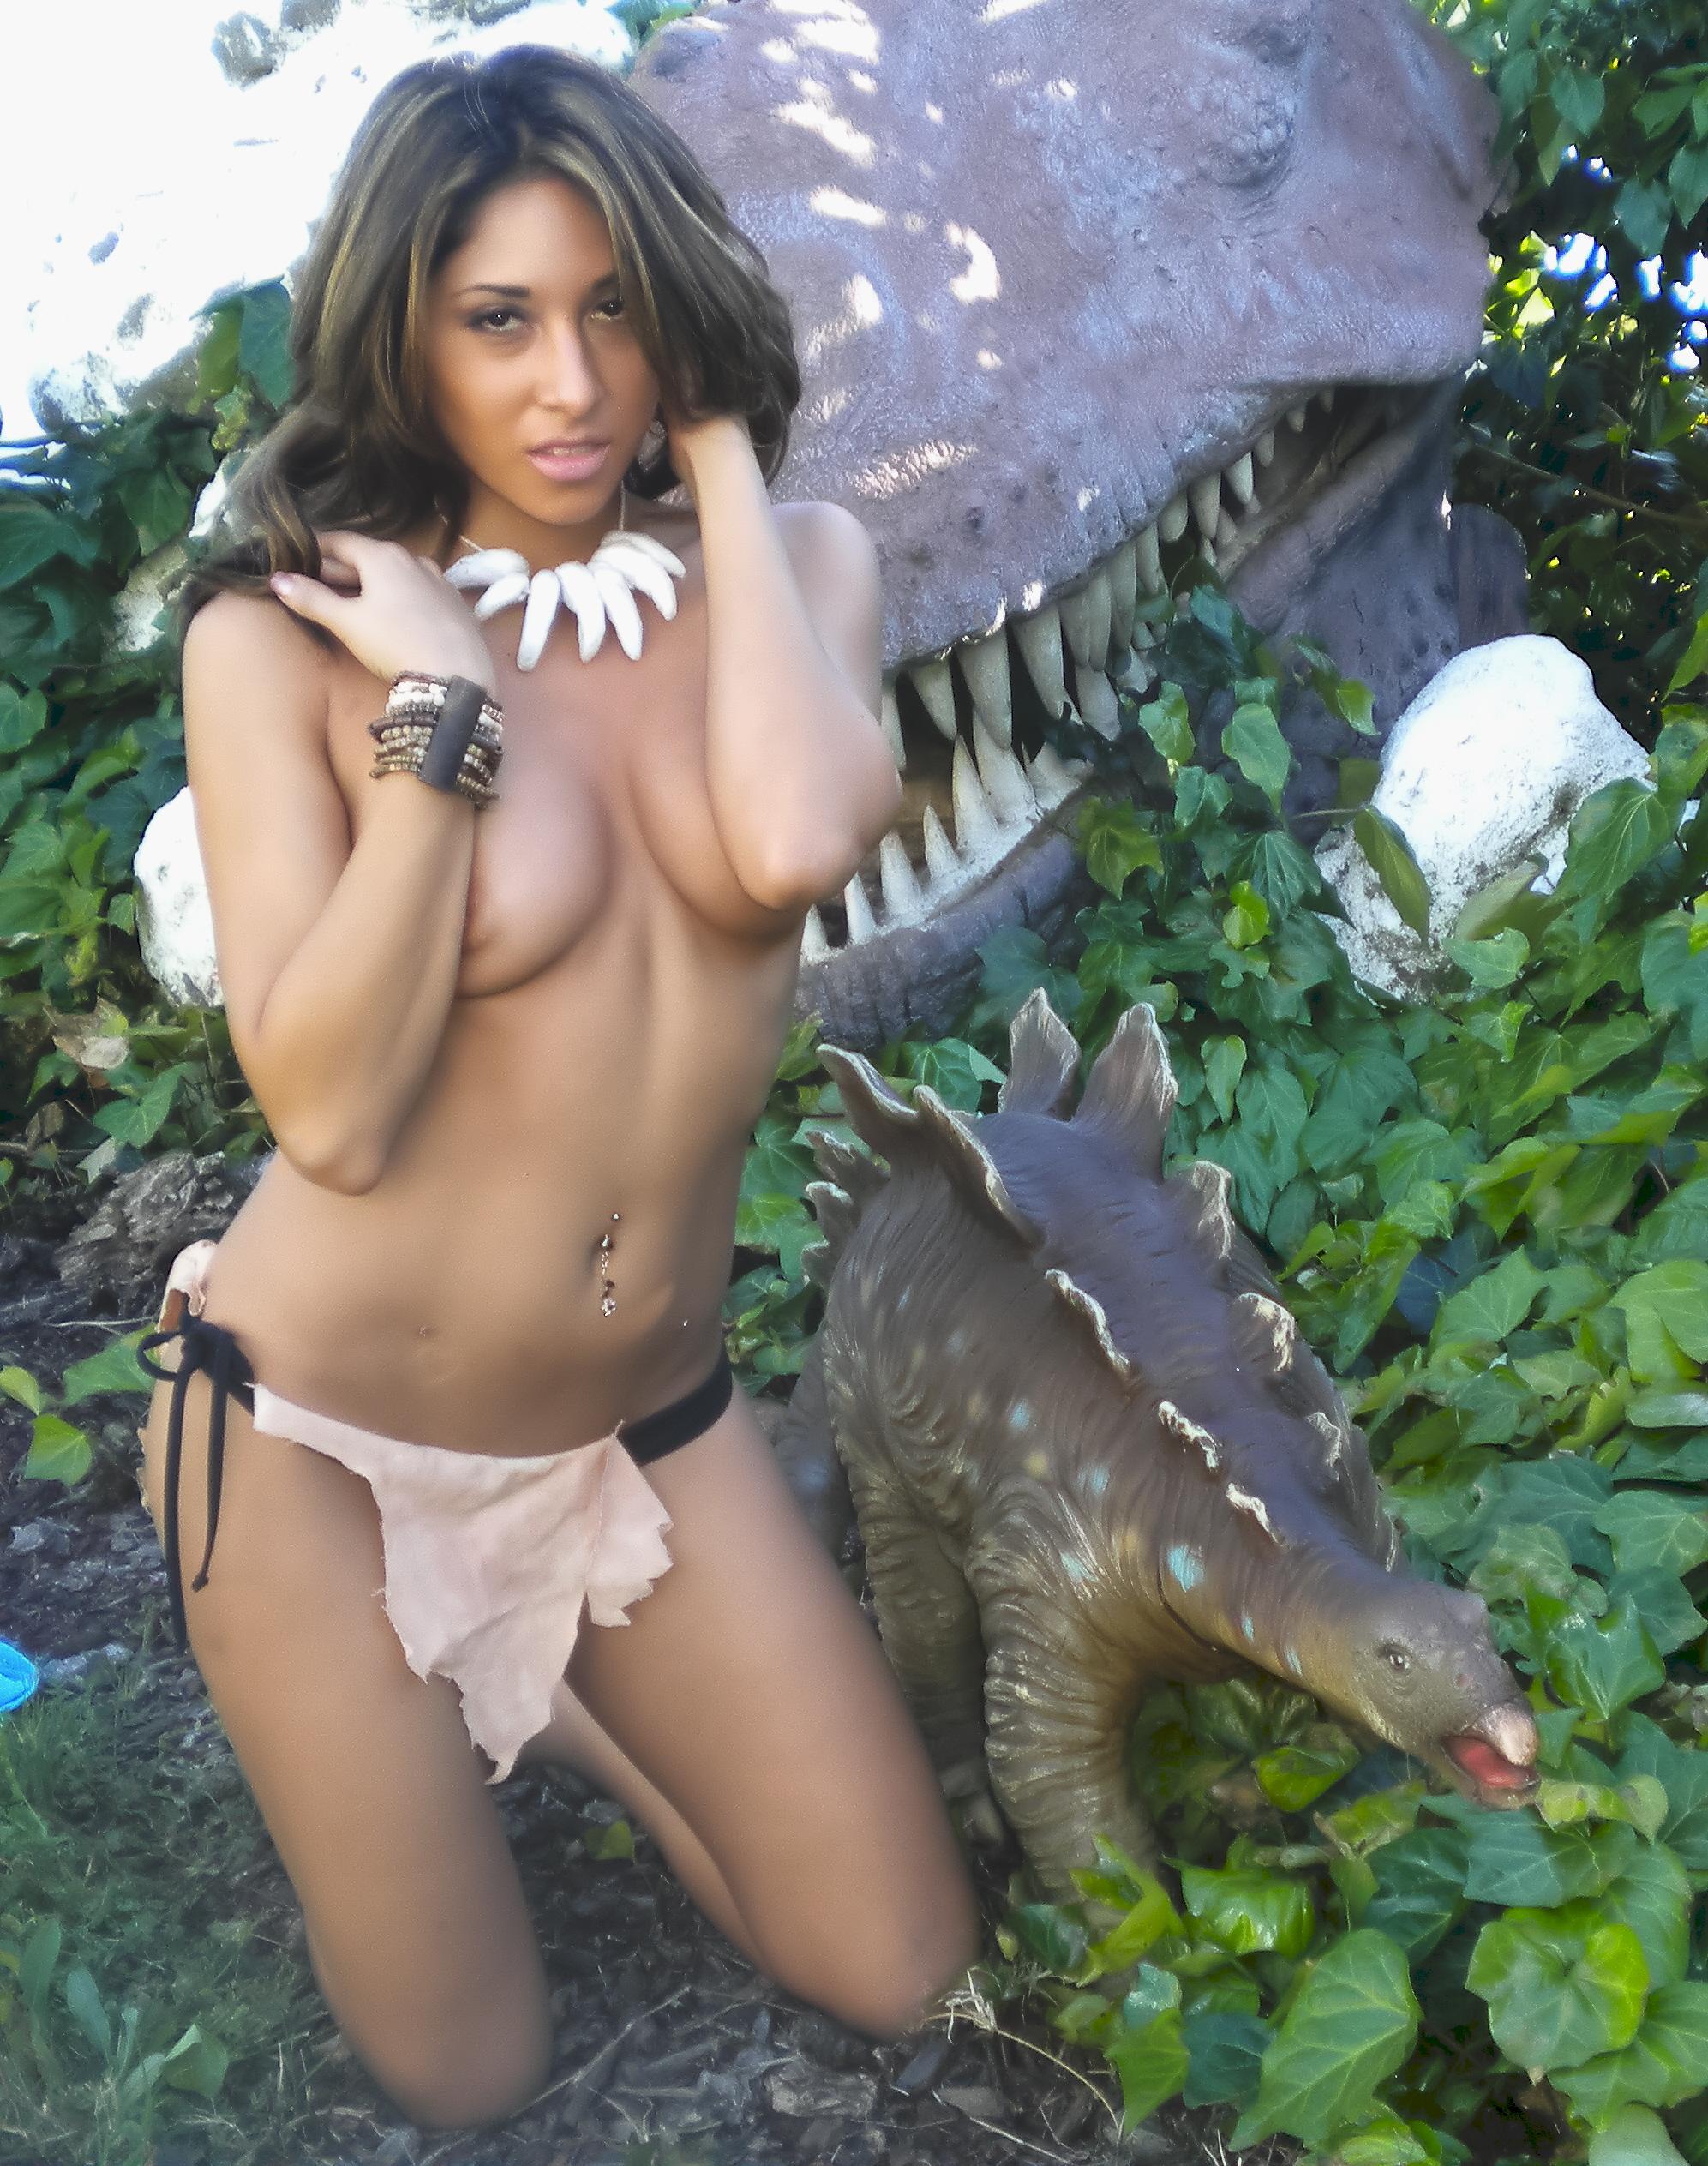 http://donglutsdinosaurs.com/wp-content/uploads/2014/09/Stegosaurus.jpg